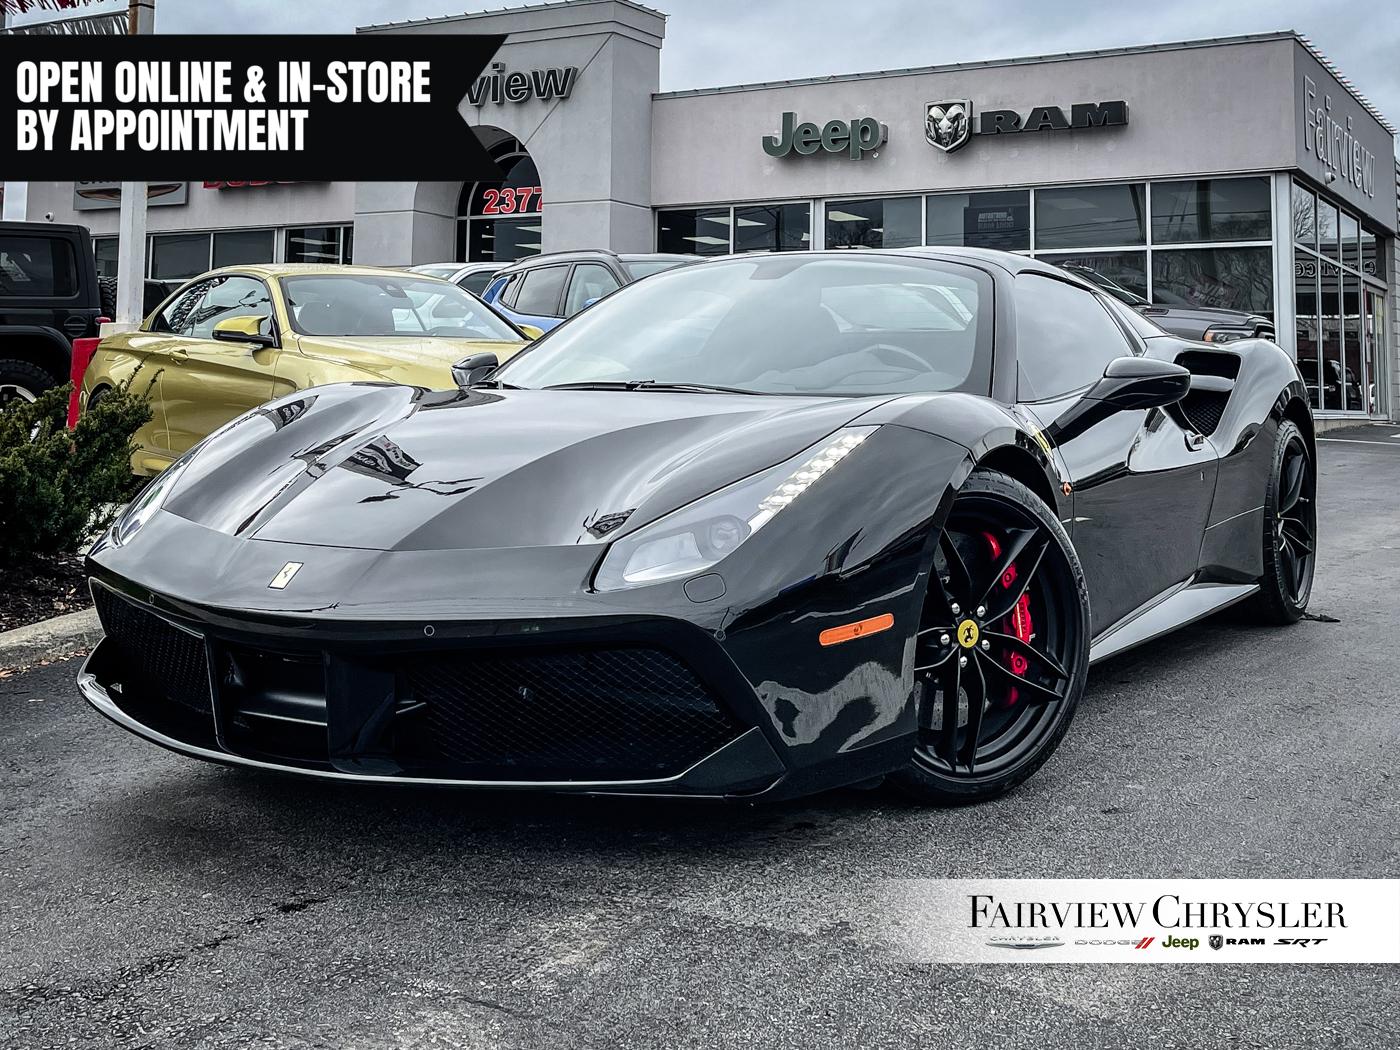 2018 Ferrari 488 Spider F1 Wheel Carbon Fibre 50075880 Burlington On Used Zff80ama5j0236643 U18196 Zff80ama5j0236643